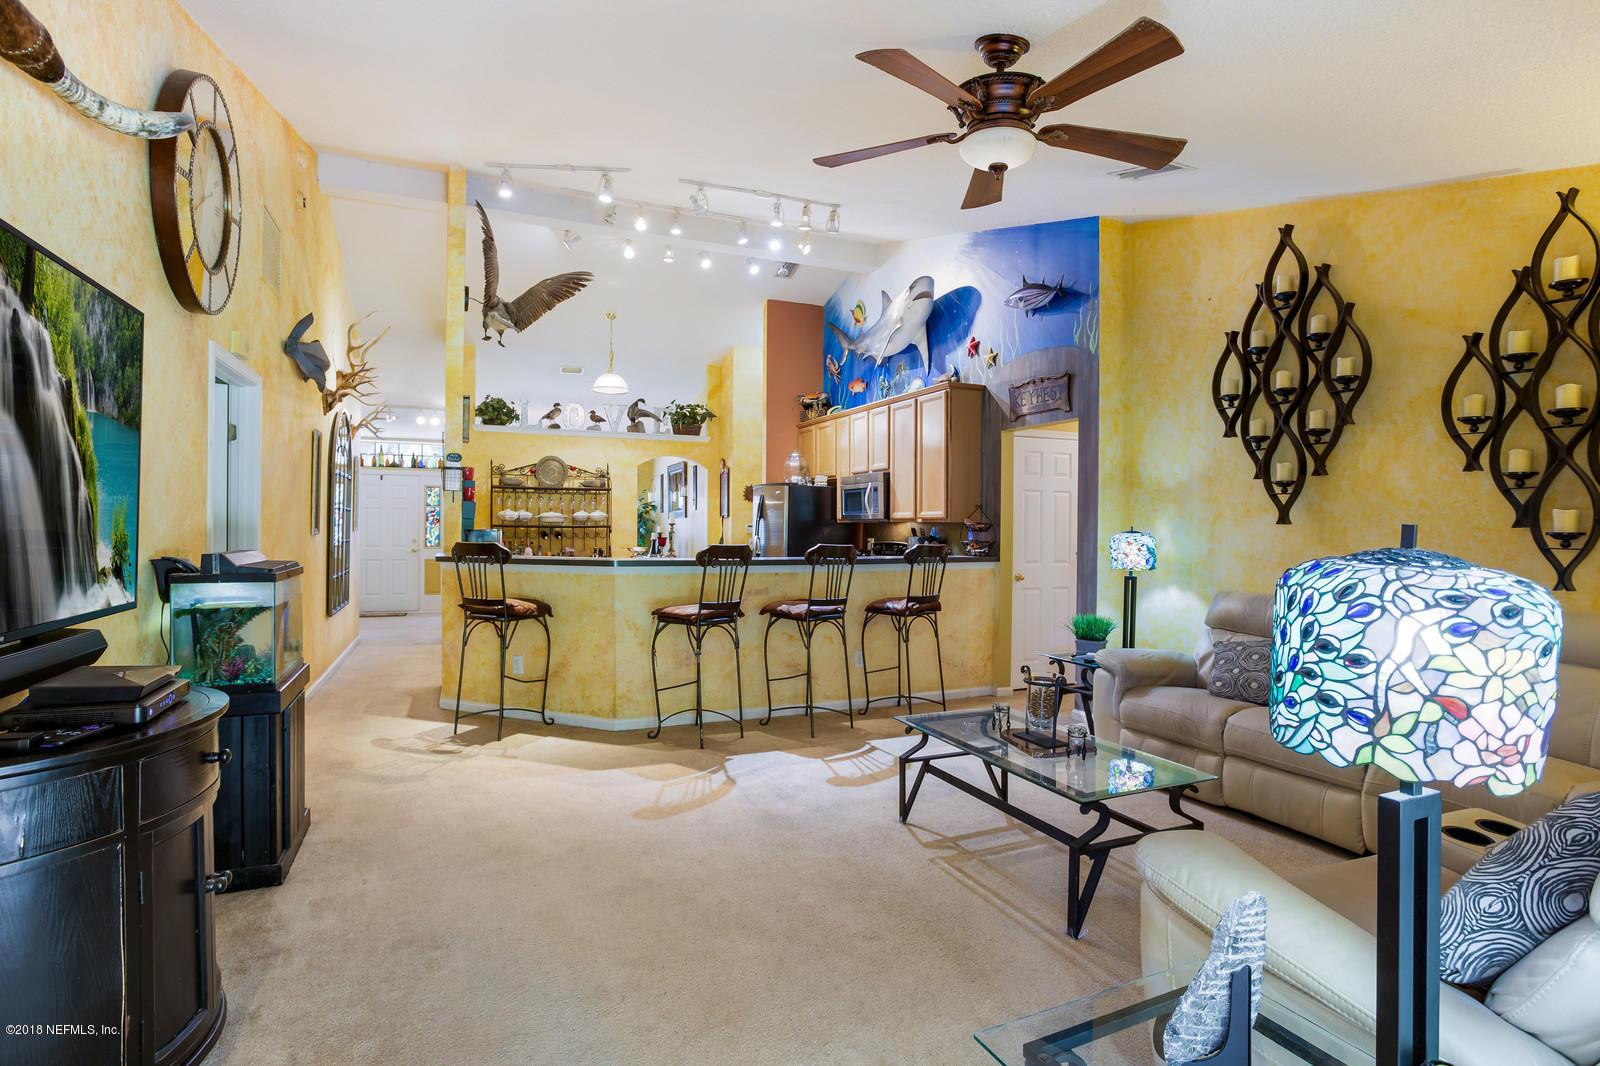 1005 WELAKA, ST AUGUSTINE, FLORIDA 32092, 3 Bedrooms Bedrooms, ,2 BathroomsBathrooms,Residential - single family,For sale,WELAKA,952147